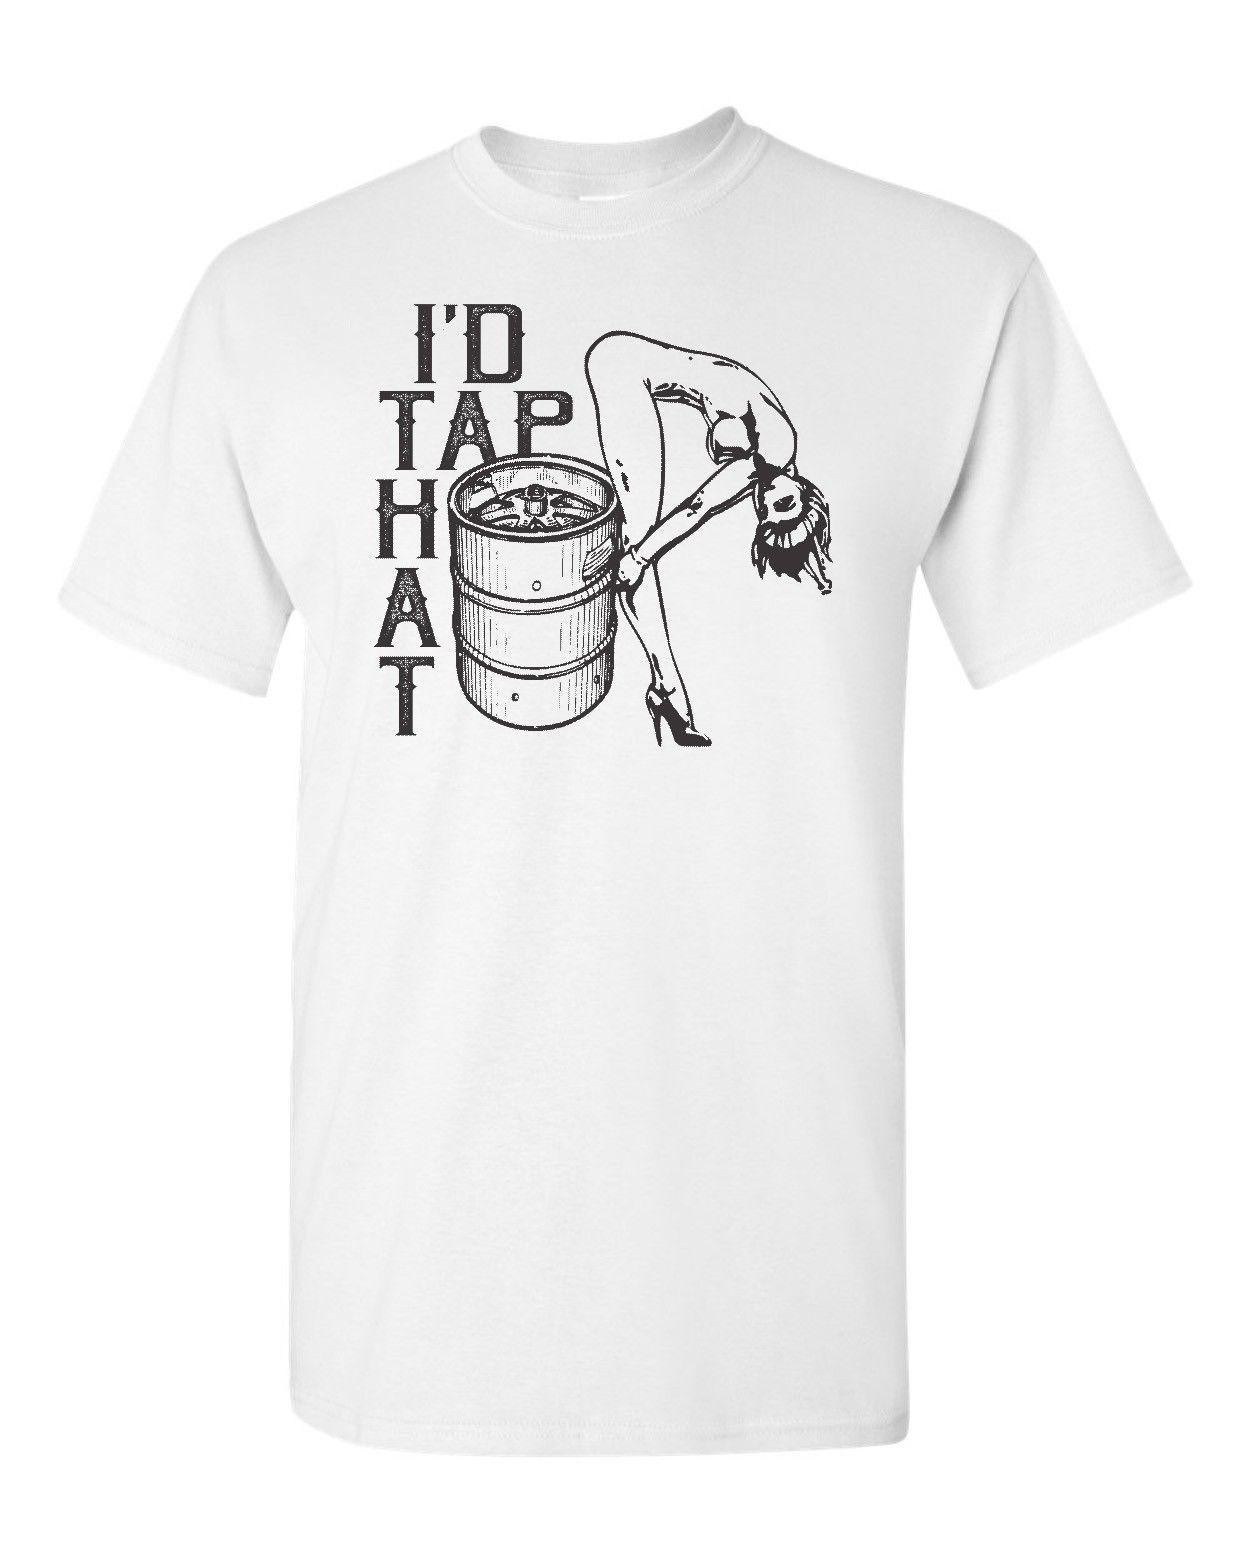 0f317172d7 I'd Tap That Beer Keg Men's Tee Shirt 1842 2018 funny tee 100% cotton cool  lovely summer t-shirt Tops